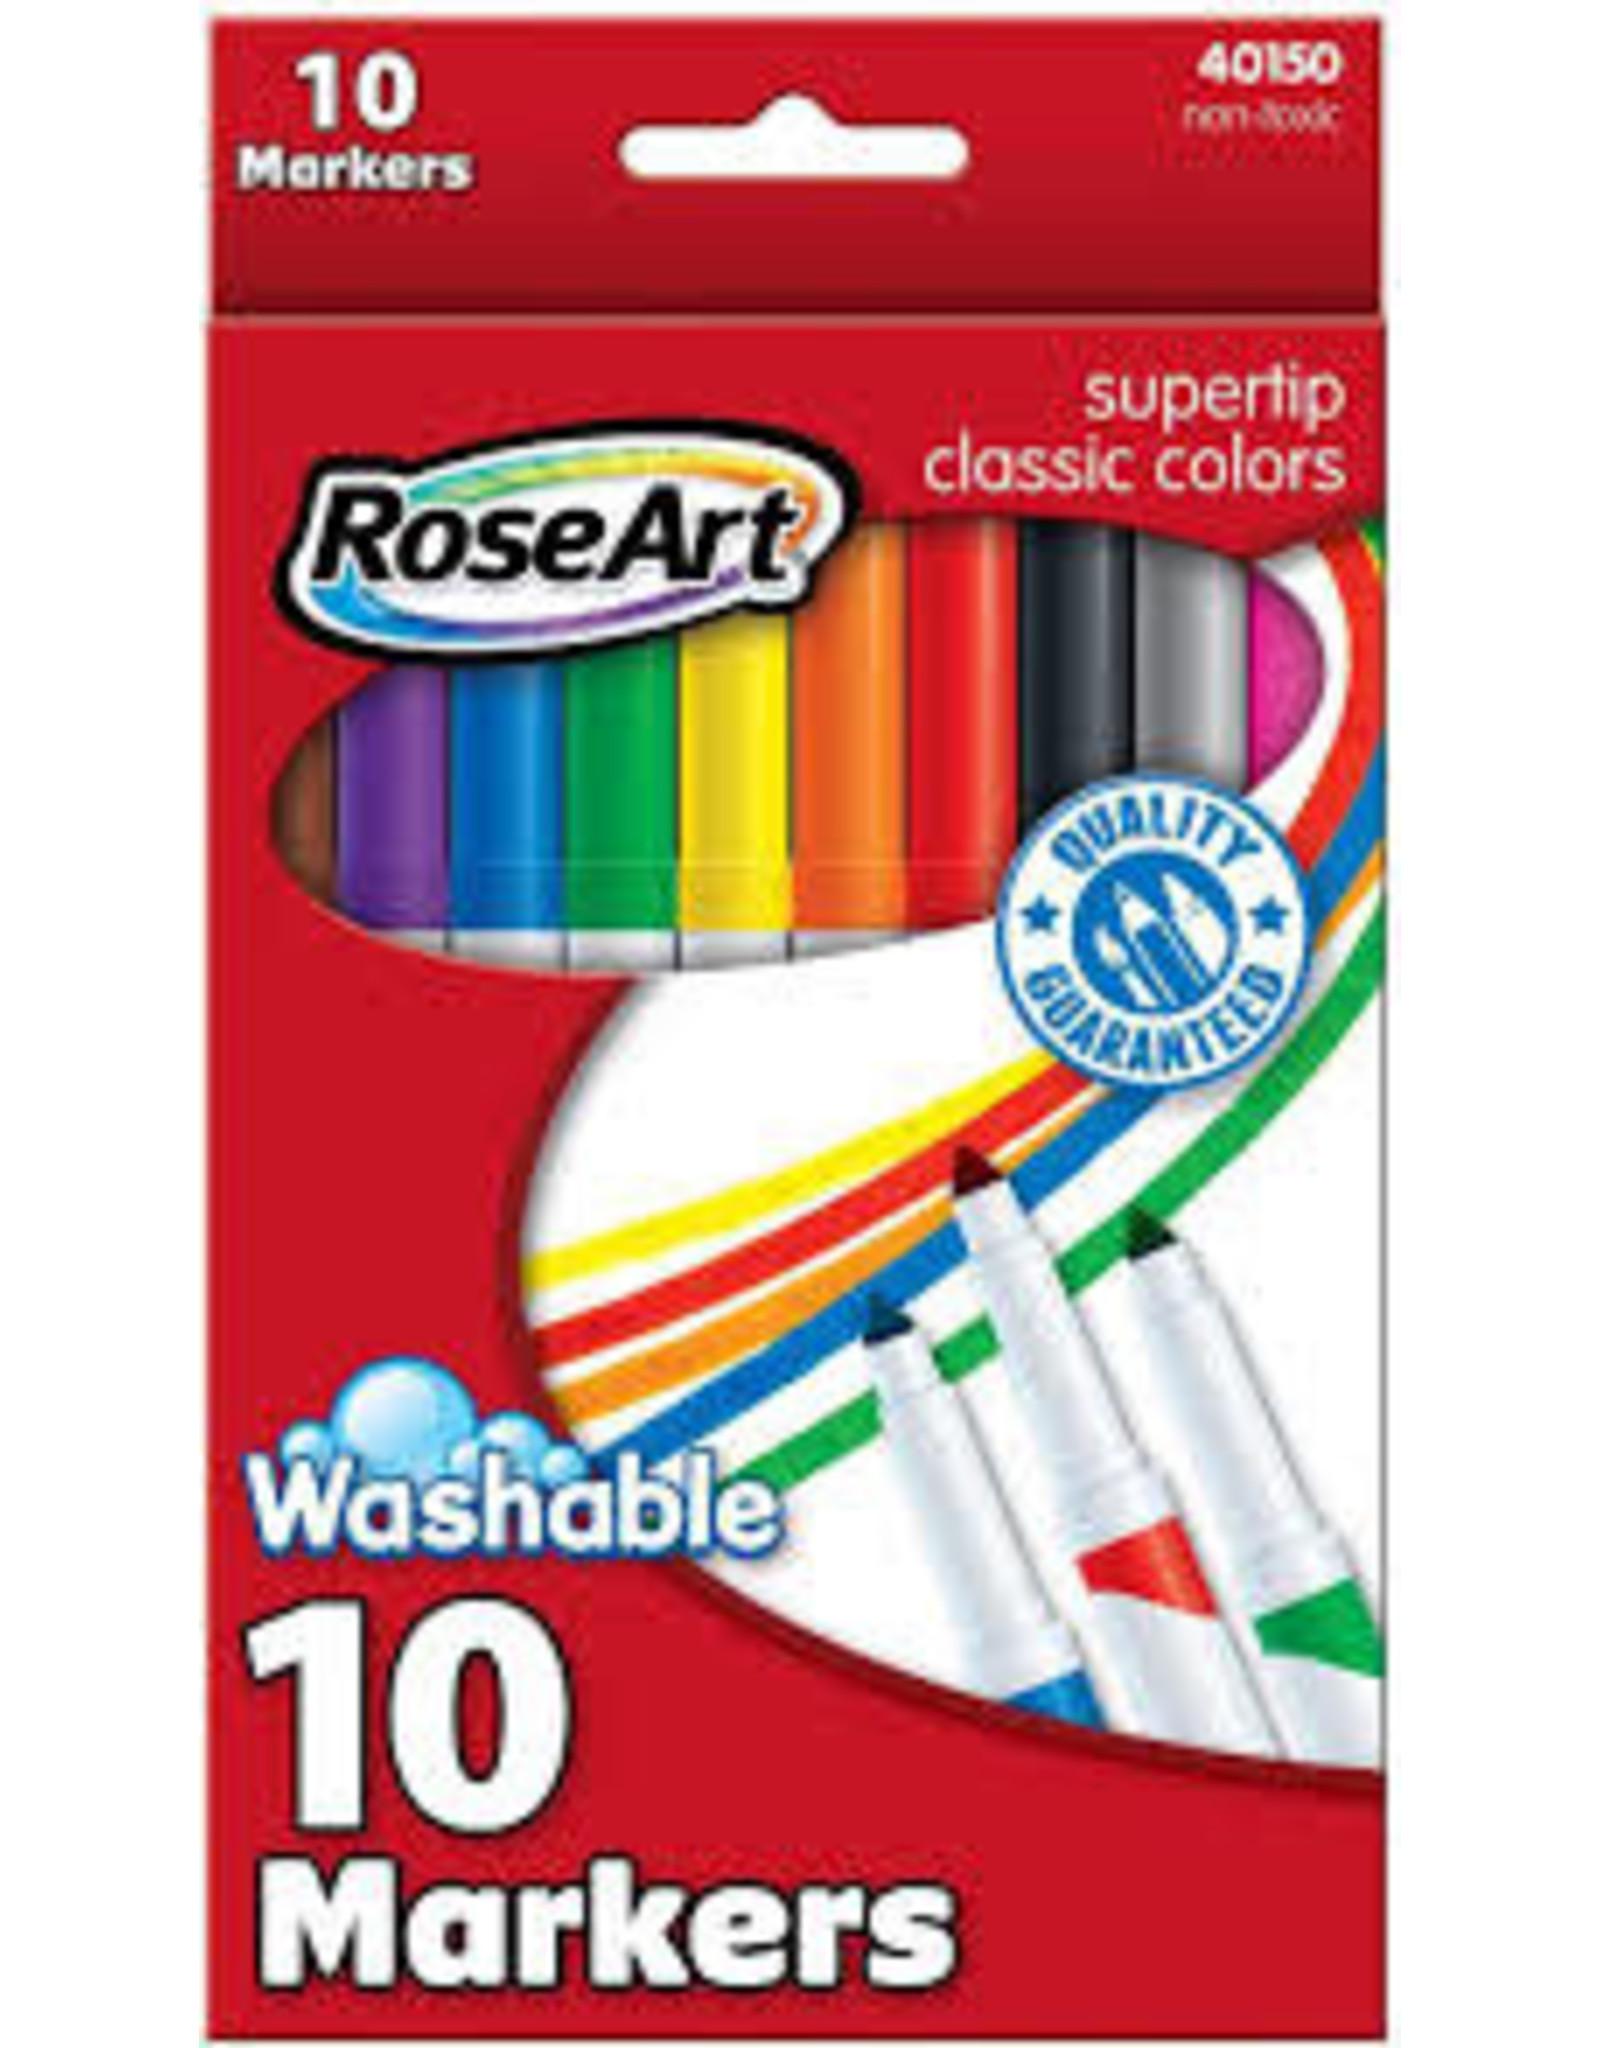 Rose art 10CT CLASSIC SUPER TIP MARKERS